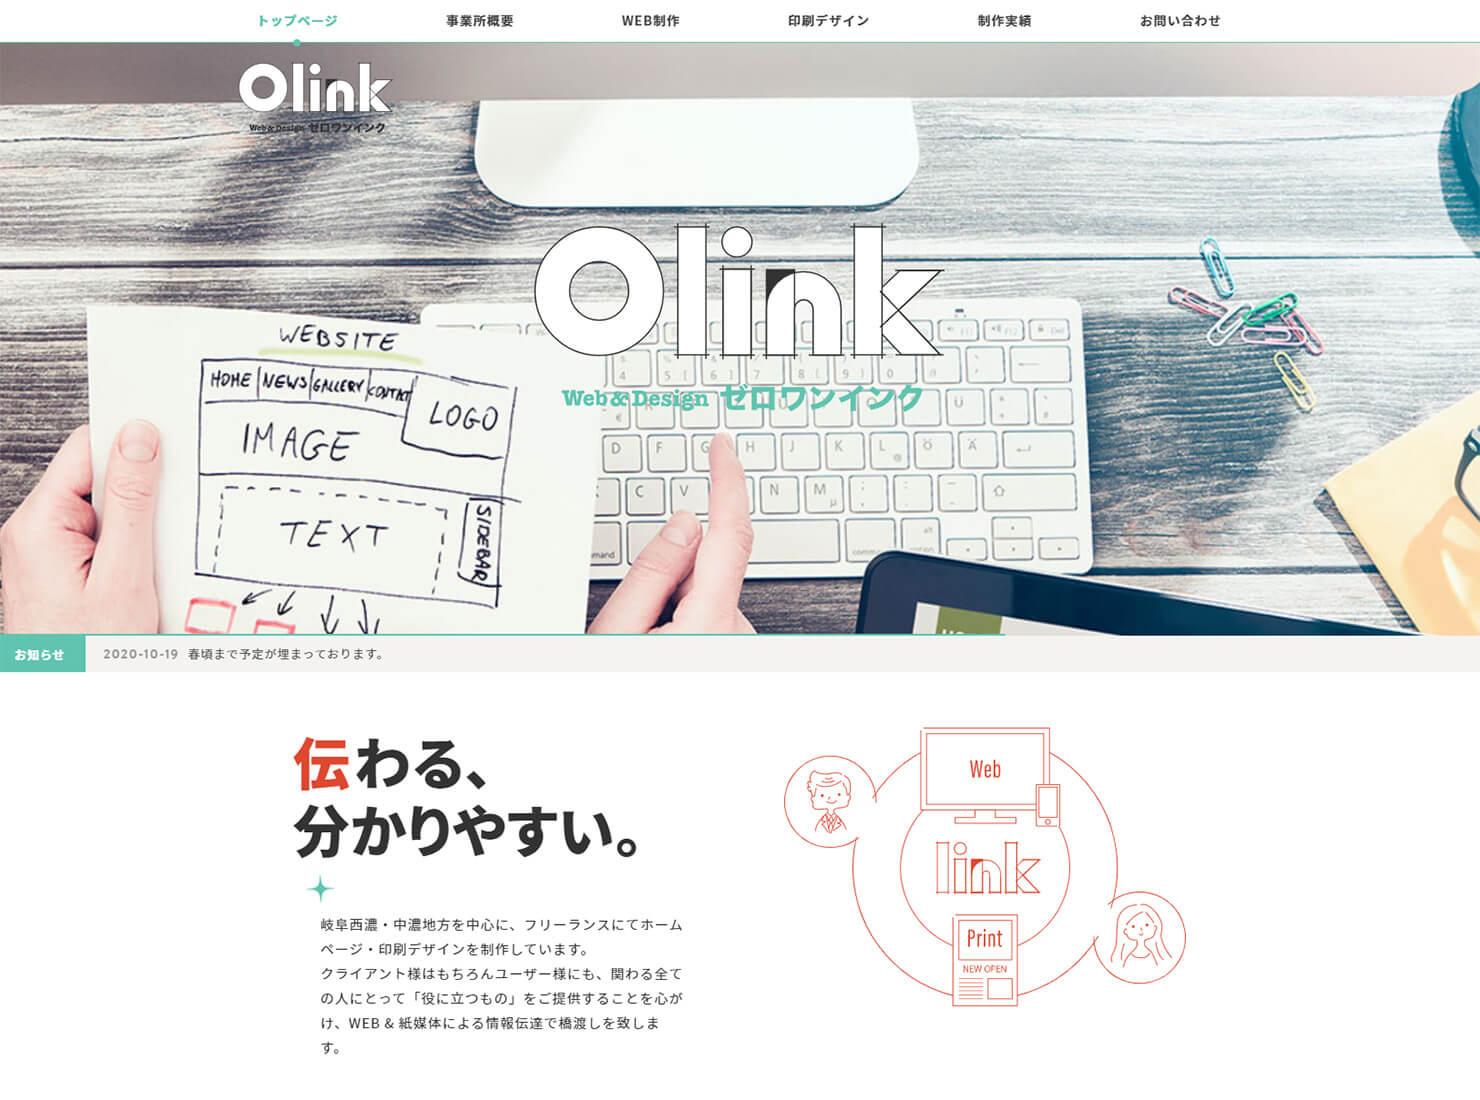 0link